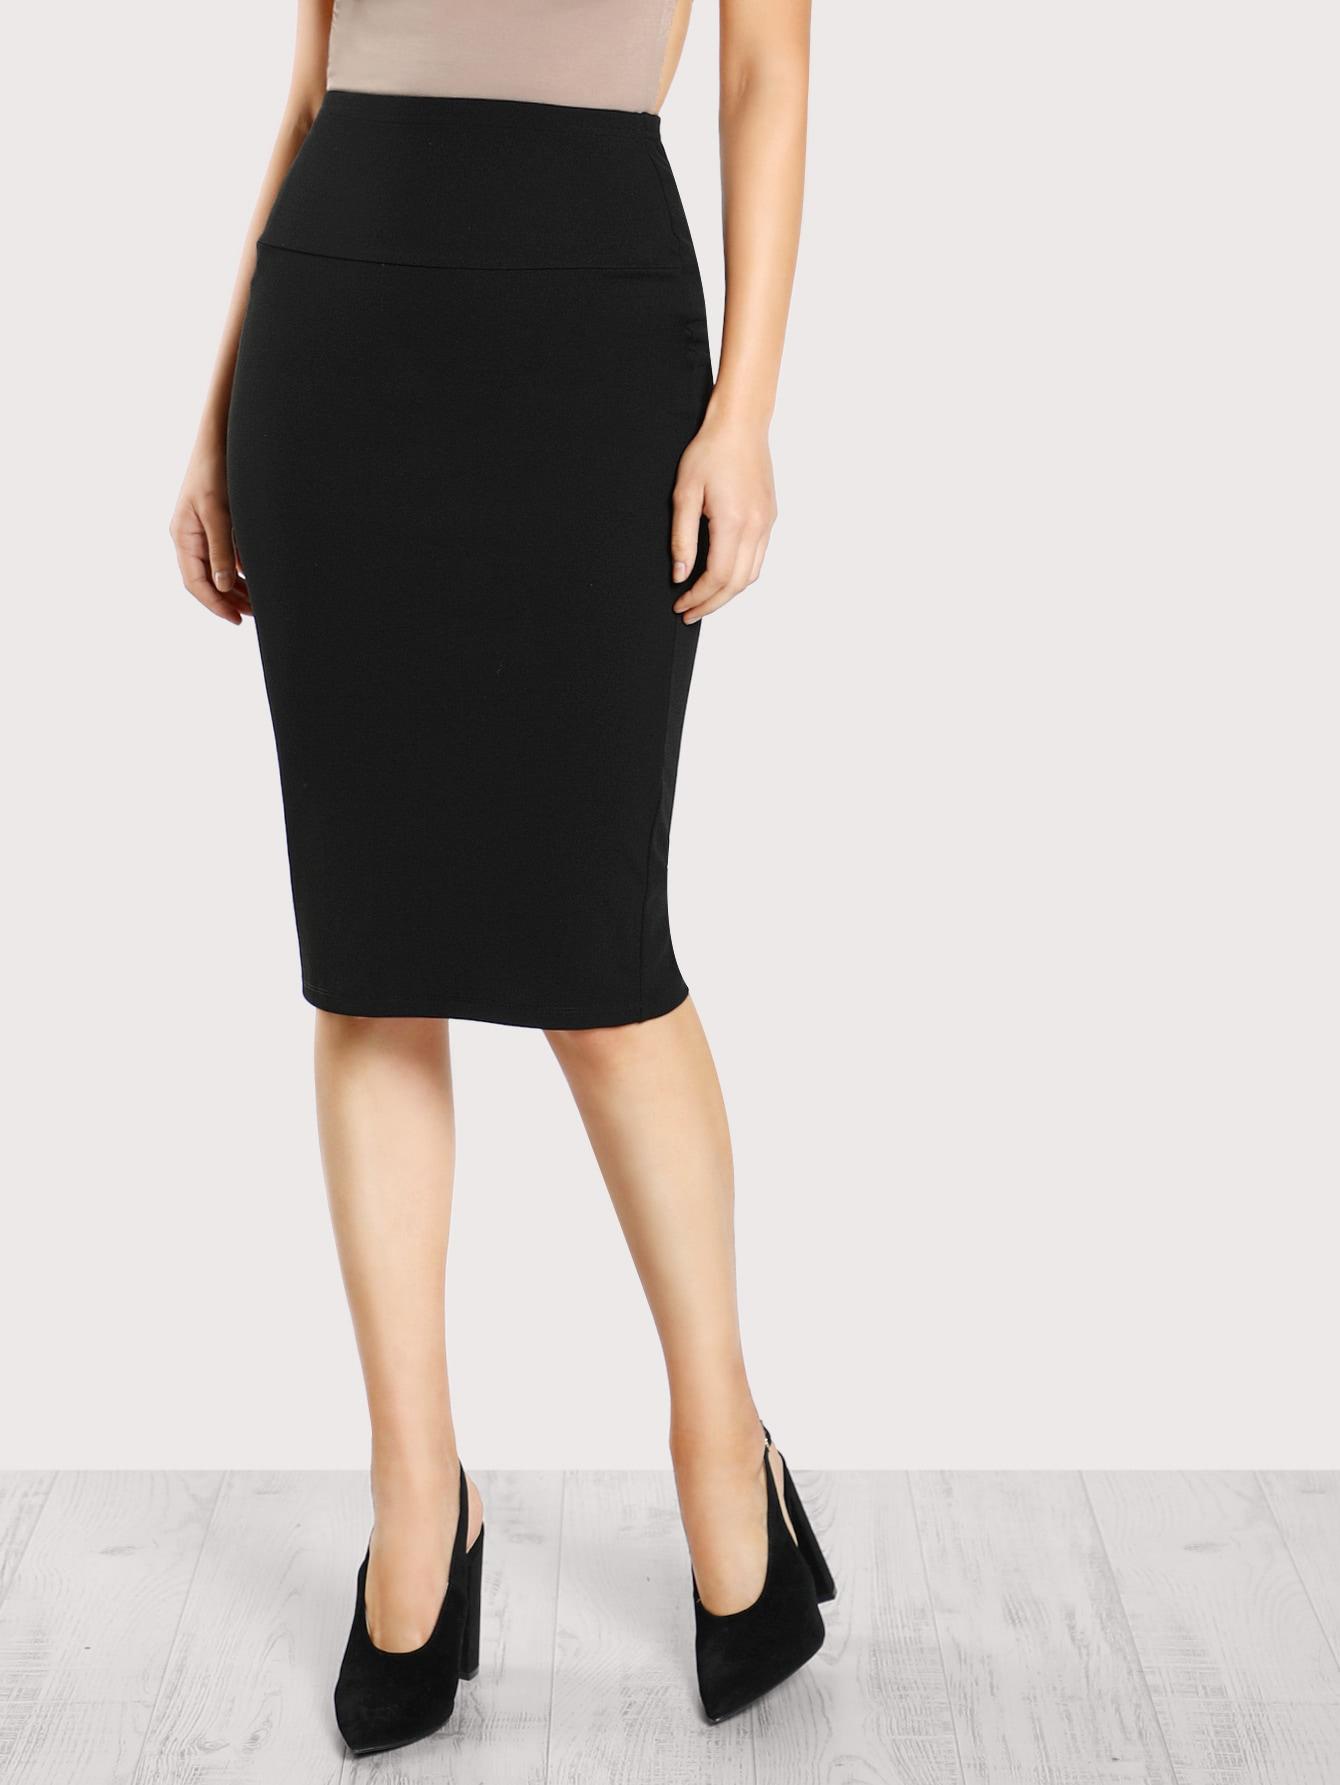 Купить Модная юбка-карандаш с эластичной талией, Christen Harper, SheIn